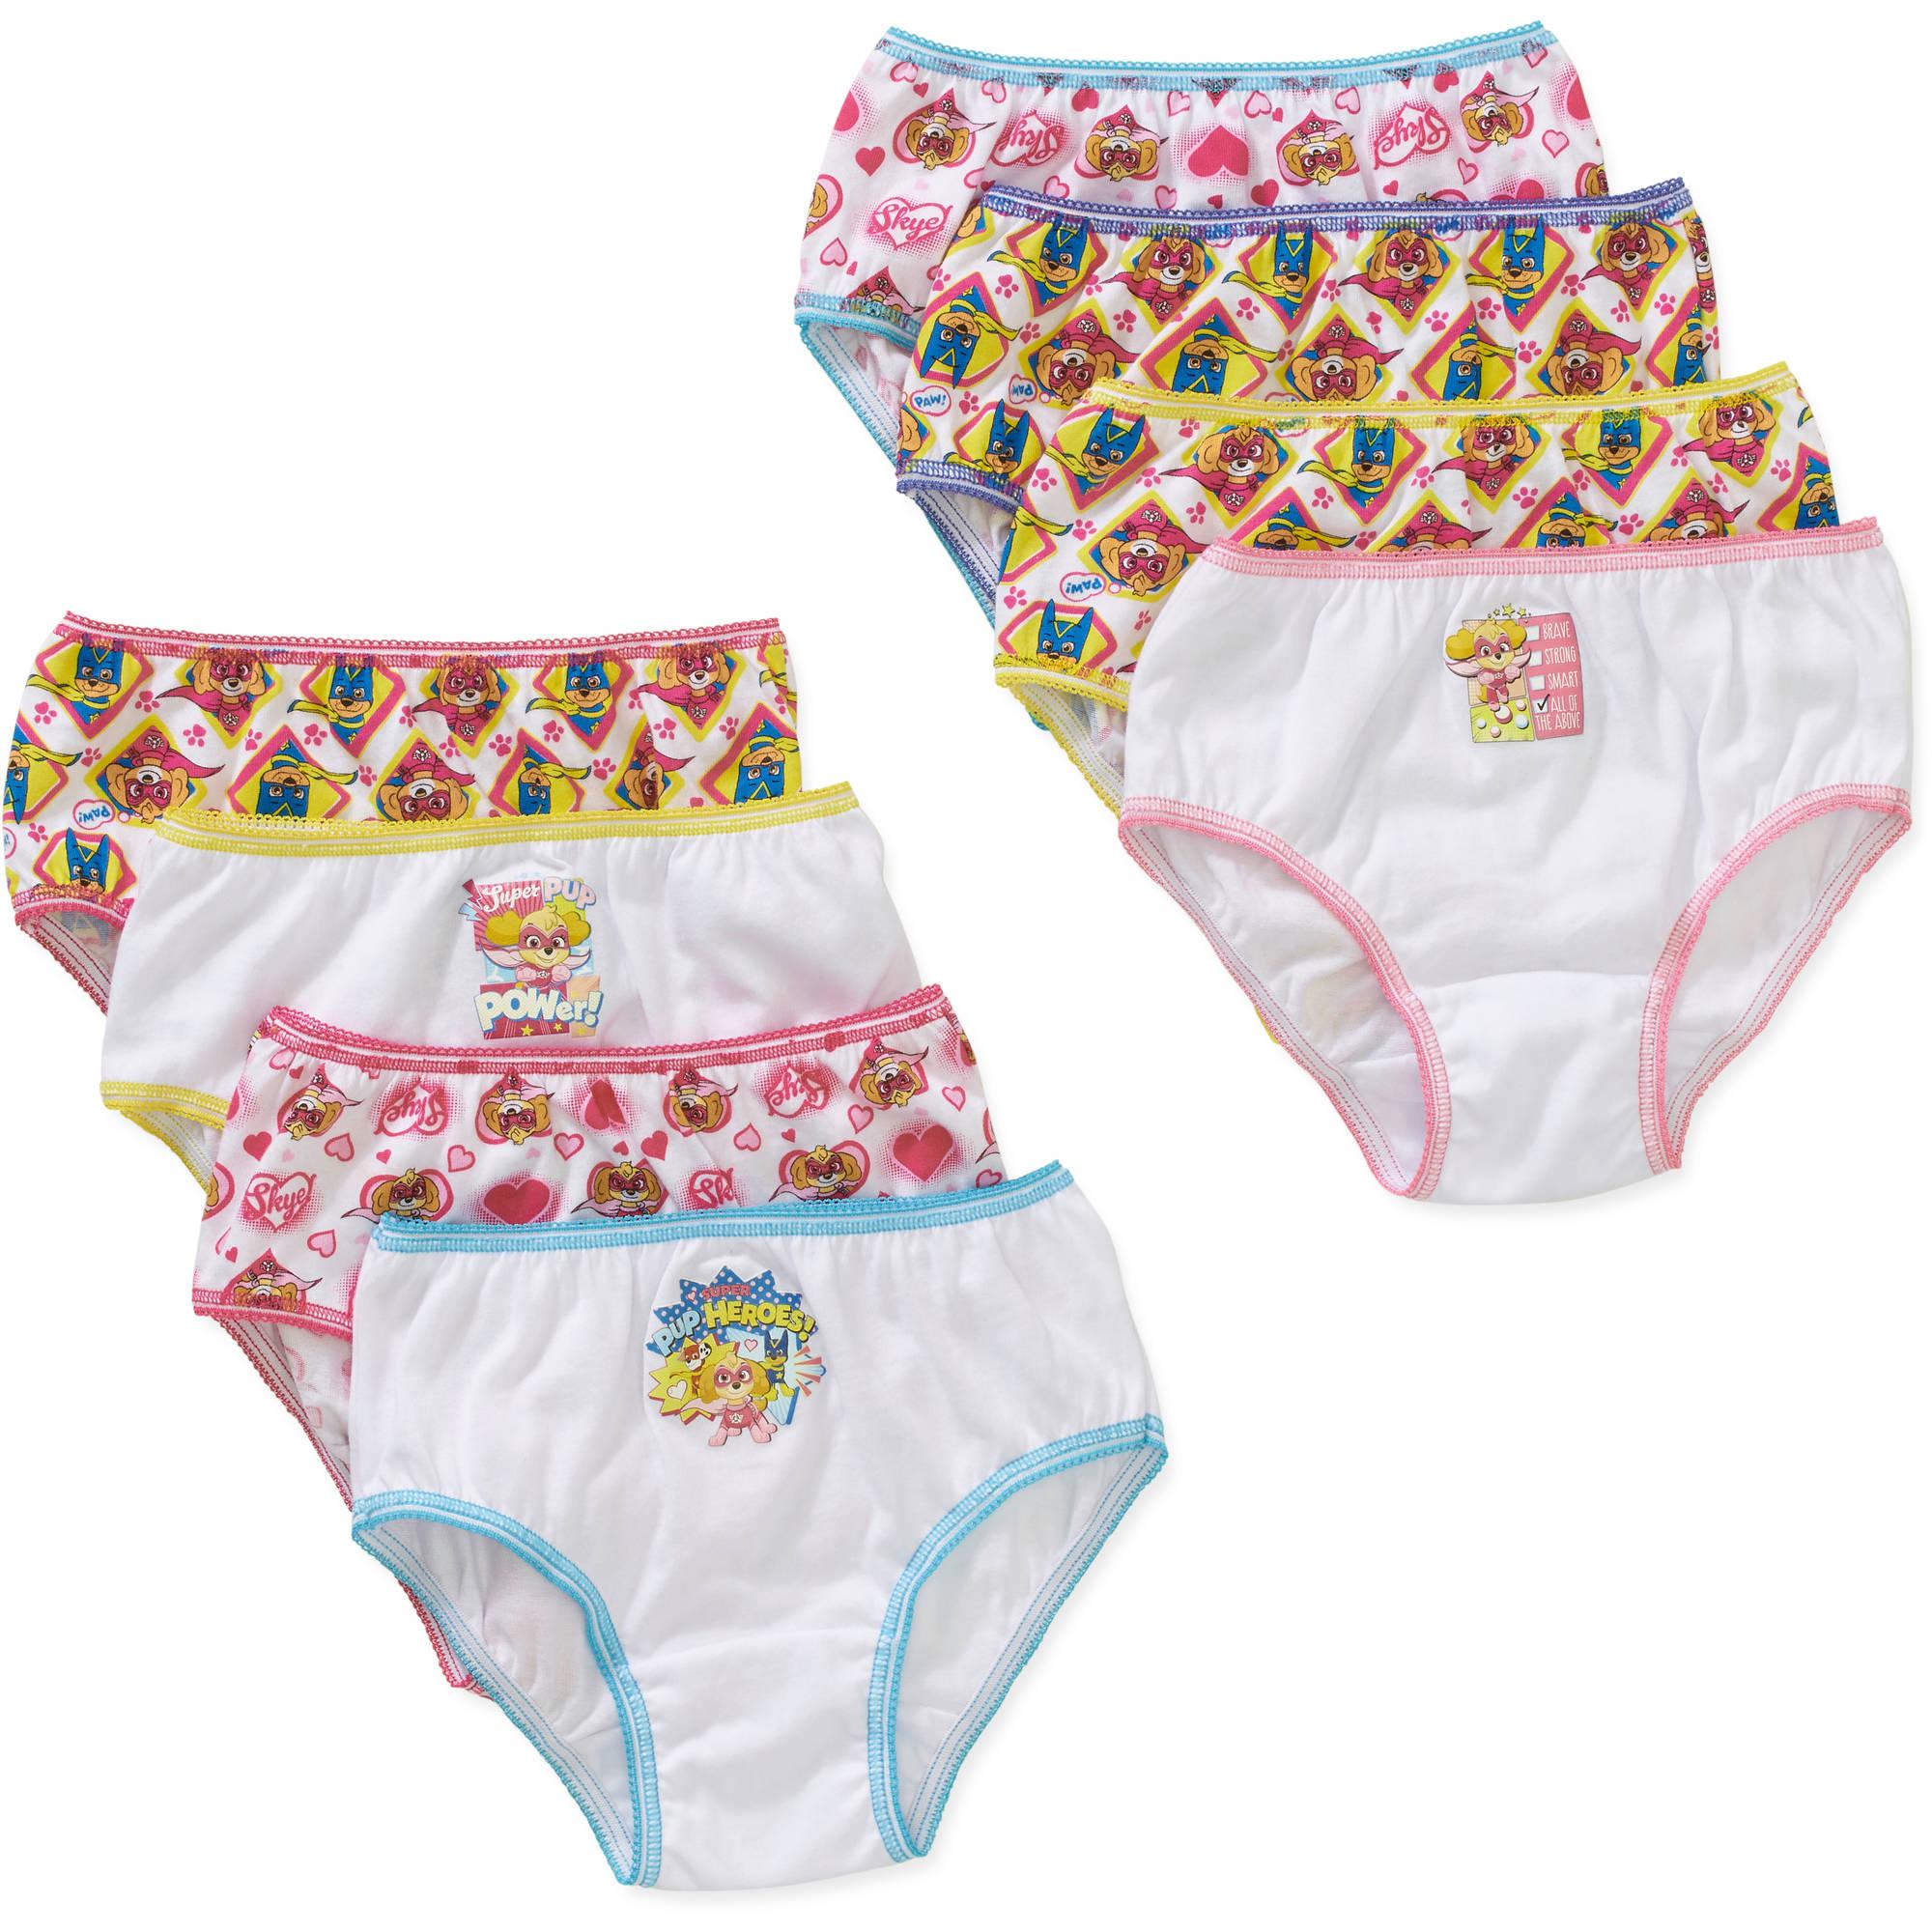 Paw Patrol Girls' Underwear 7+1 Bonus Pack